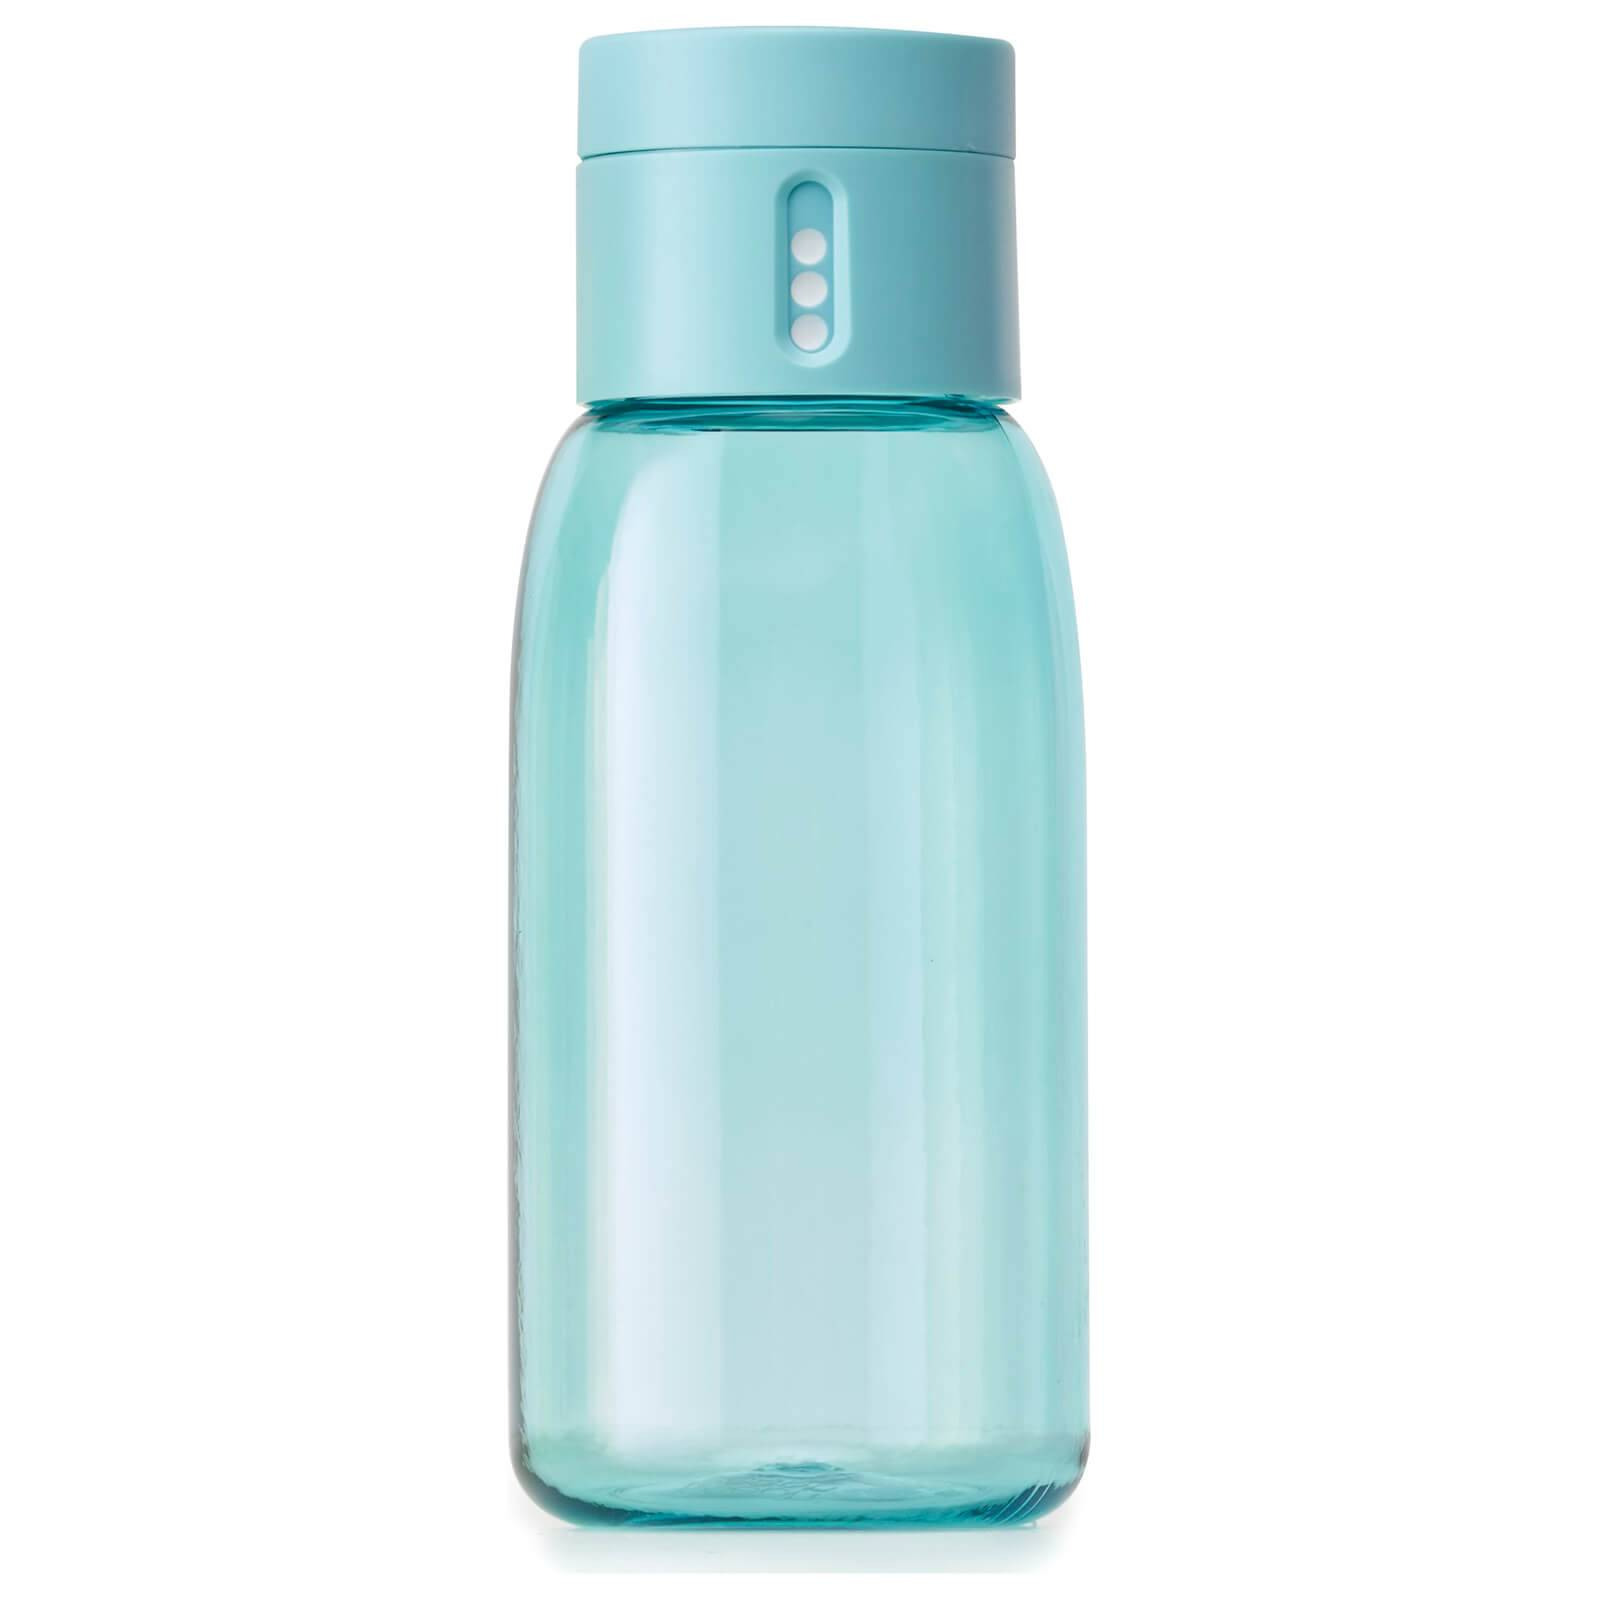 Joseph Joseph Dot Hydration-Tracking Water Bottle - Turquoise 400ml